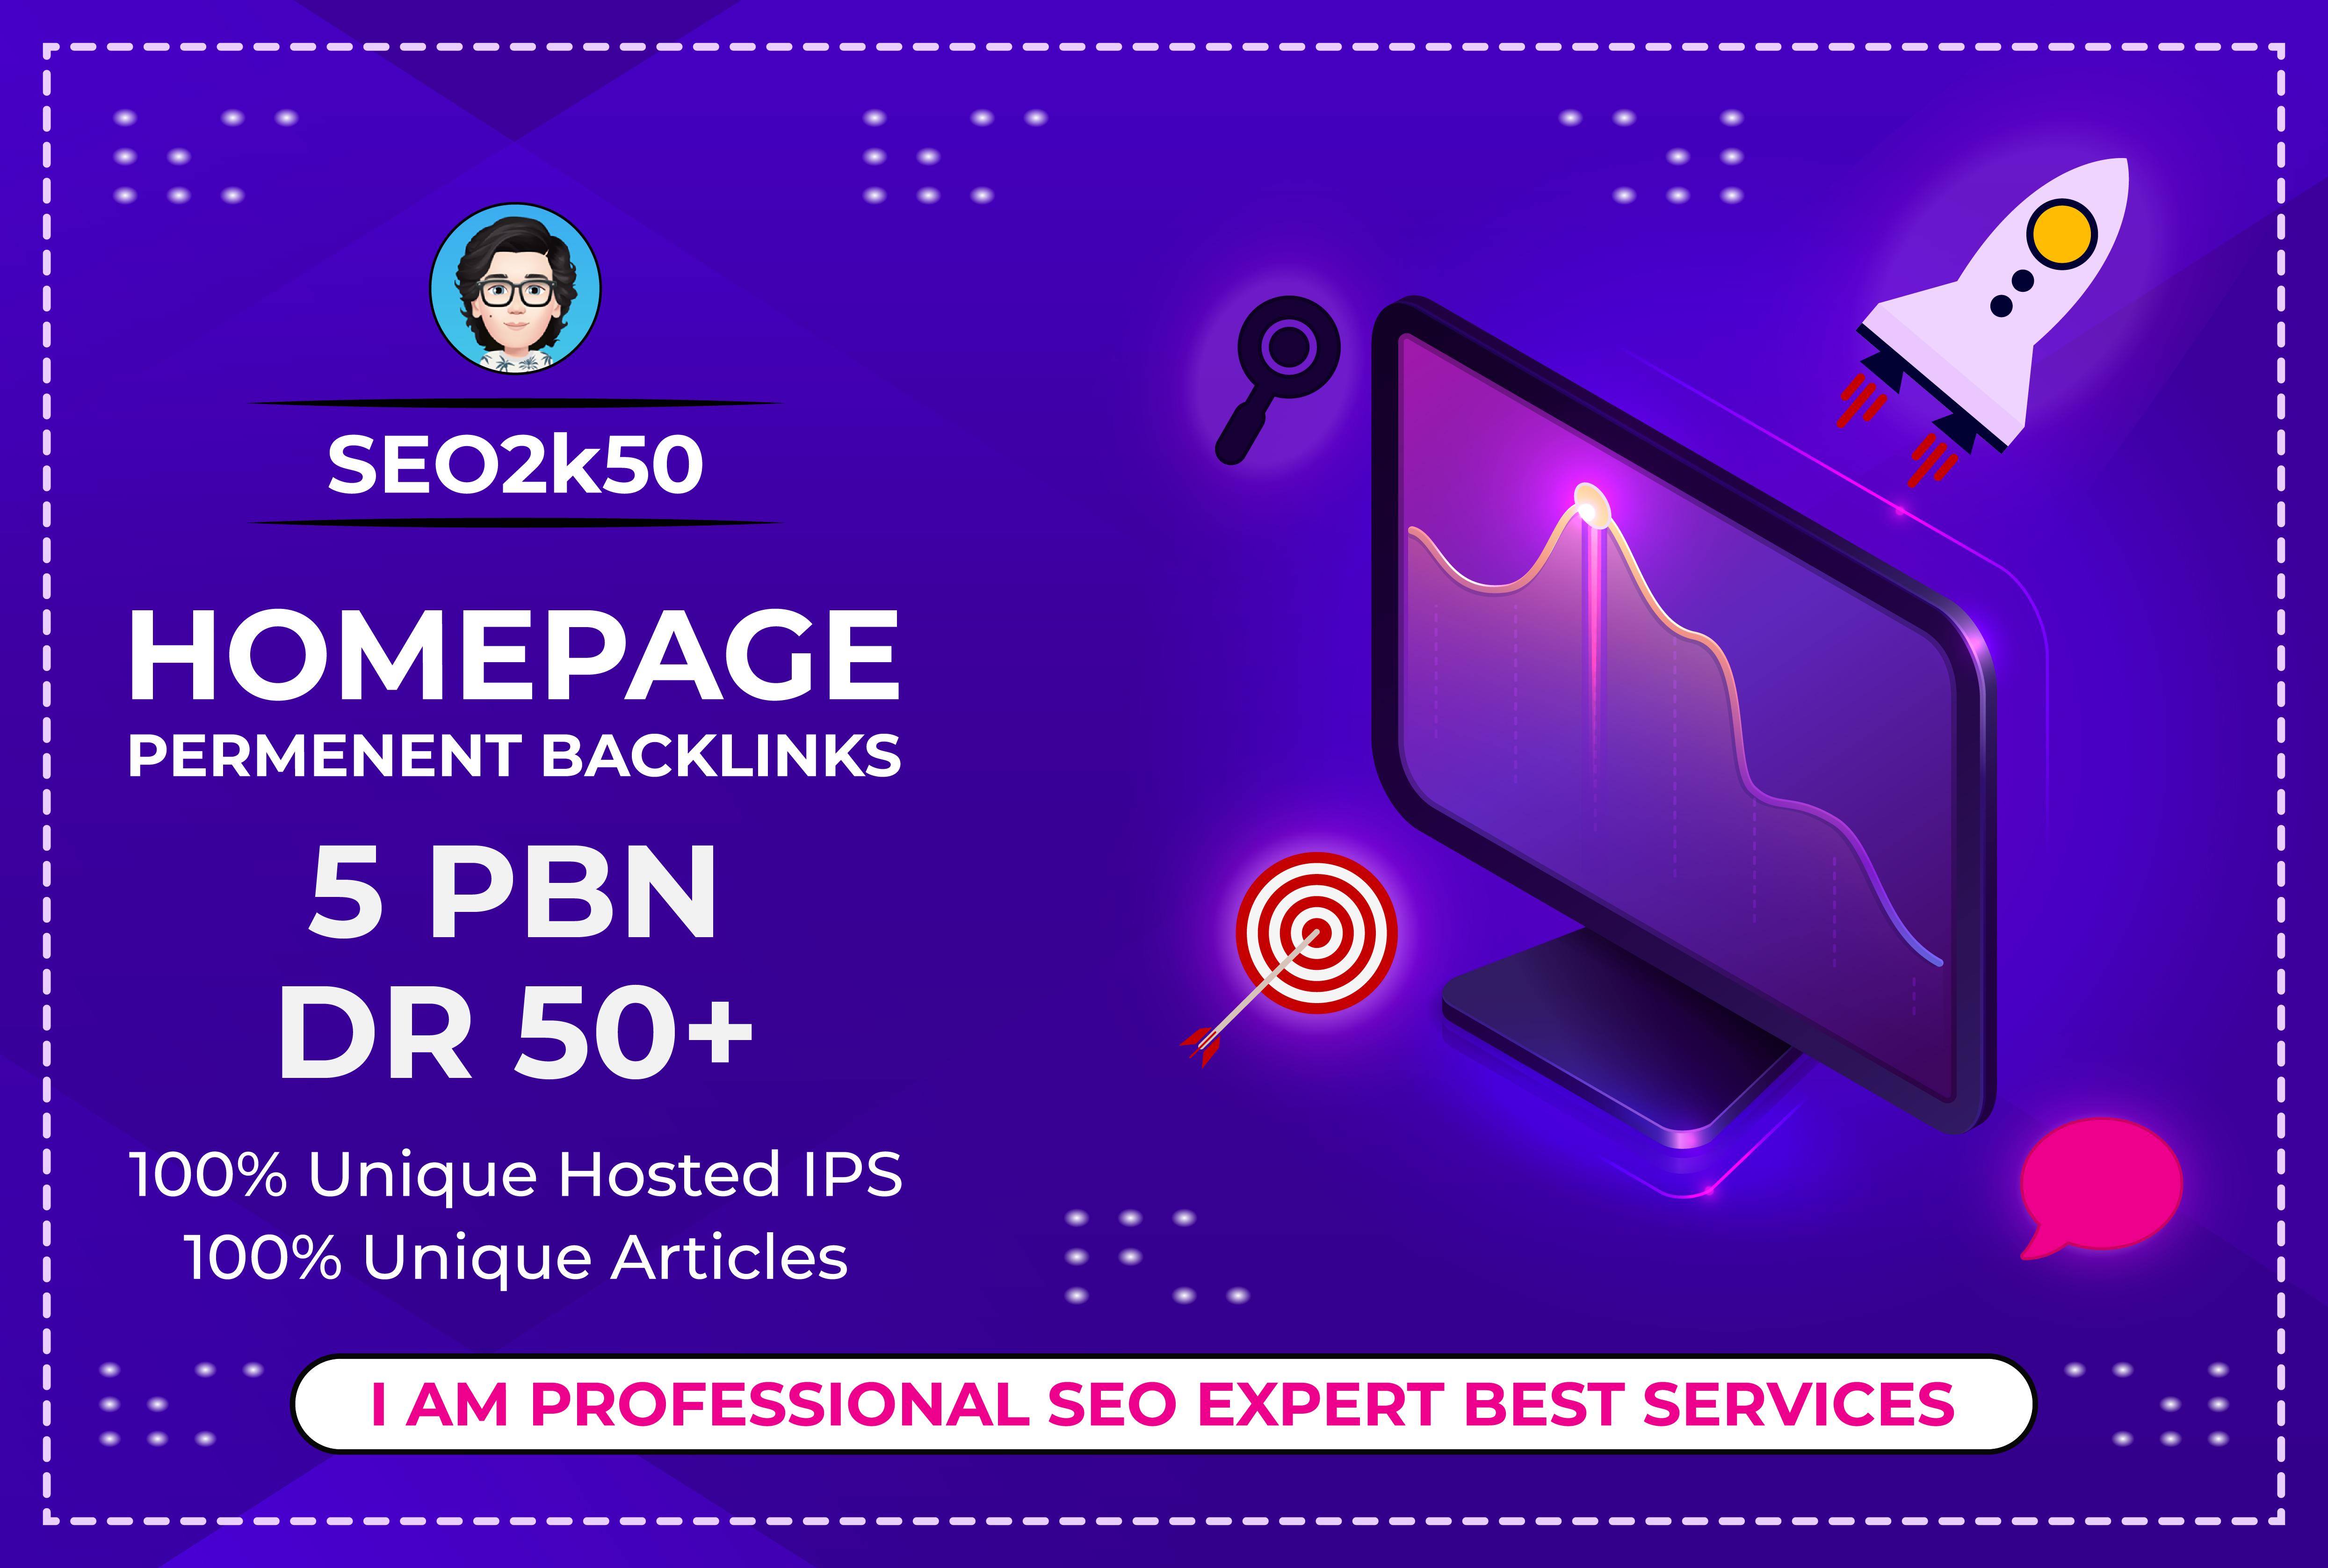 Bluild 5 PBN DR 50+high quality homepage dofollow backlinks